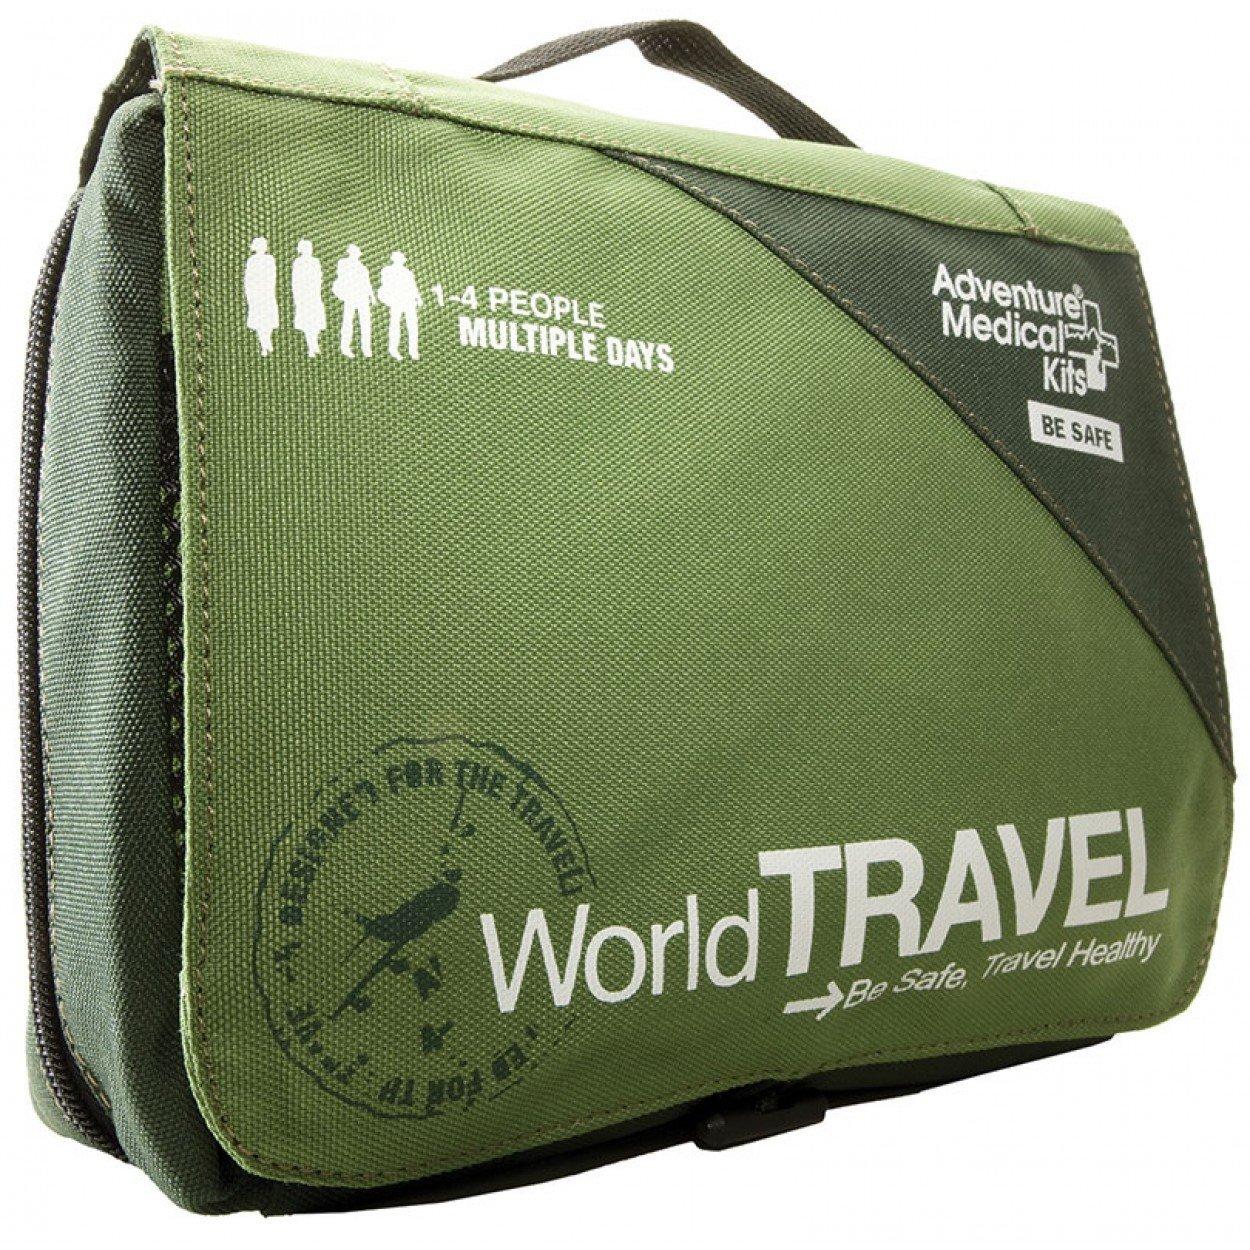 Adventure Medical Kit Mountain Series World Travel Medical Kit JR1AMKwt